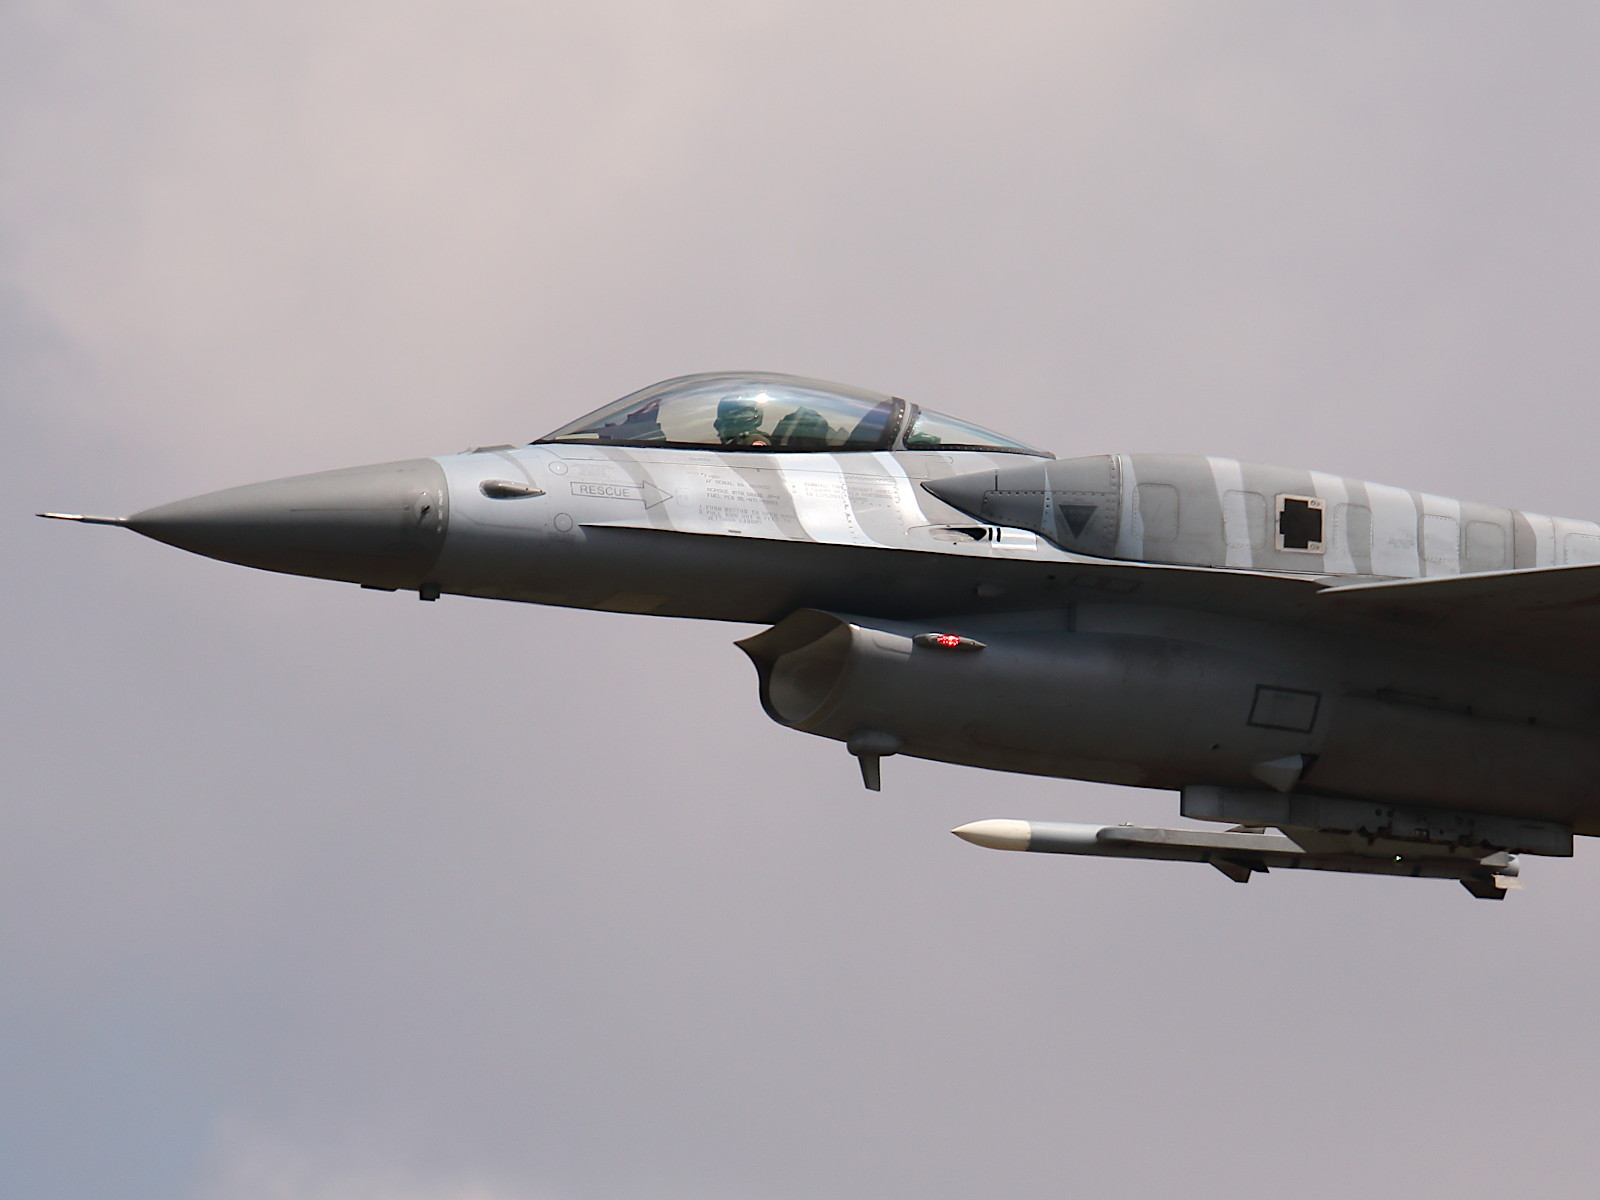 Lockheed Martin F-16C (Block 52) Fighting Falcon 4052 aus Polen © Doppeladler.com